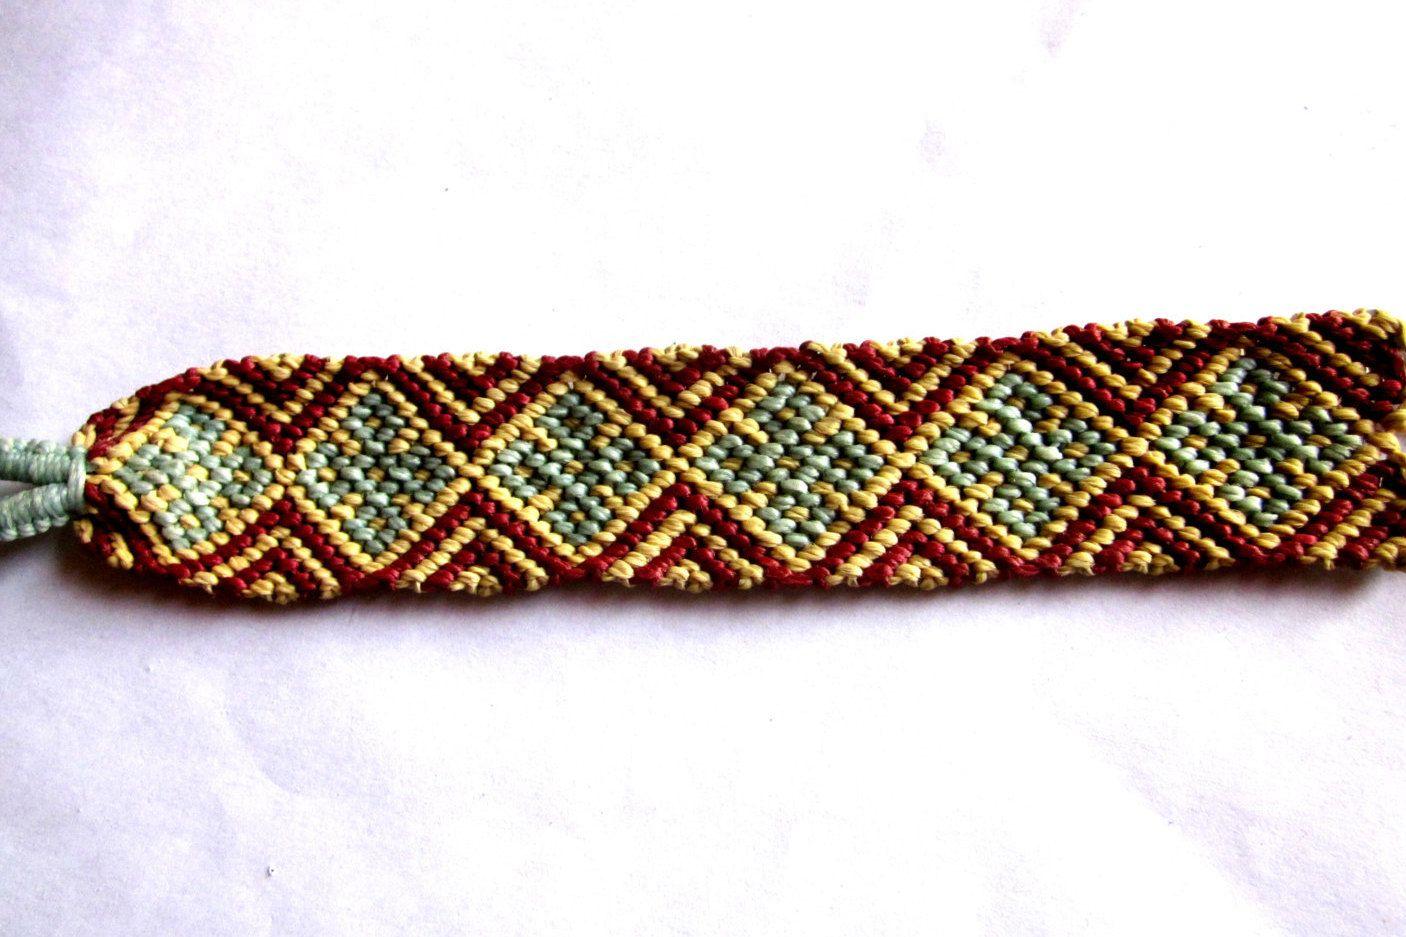 Stars and Diamonds Woven Friendship Bracelet by TheGringaHippie on Etsy